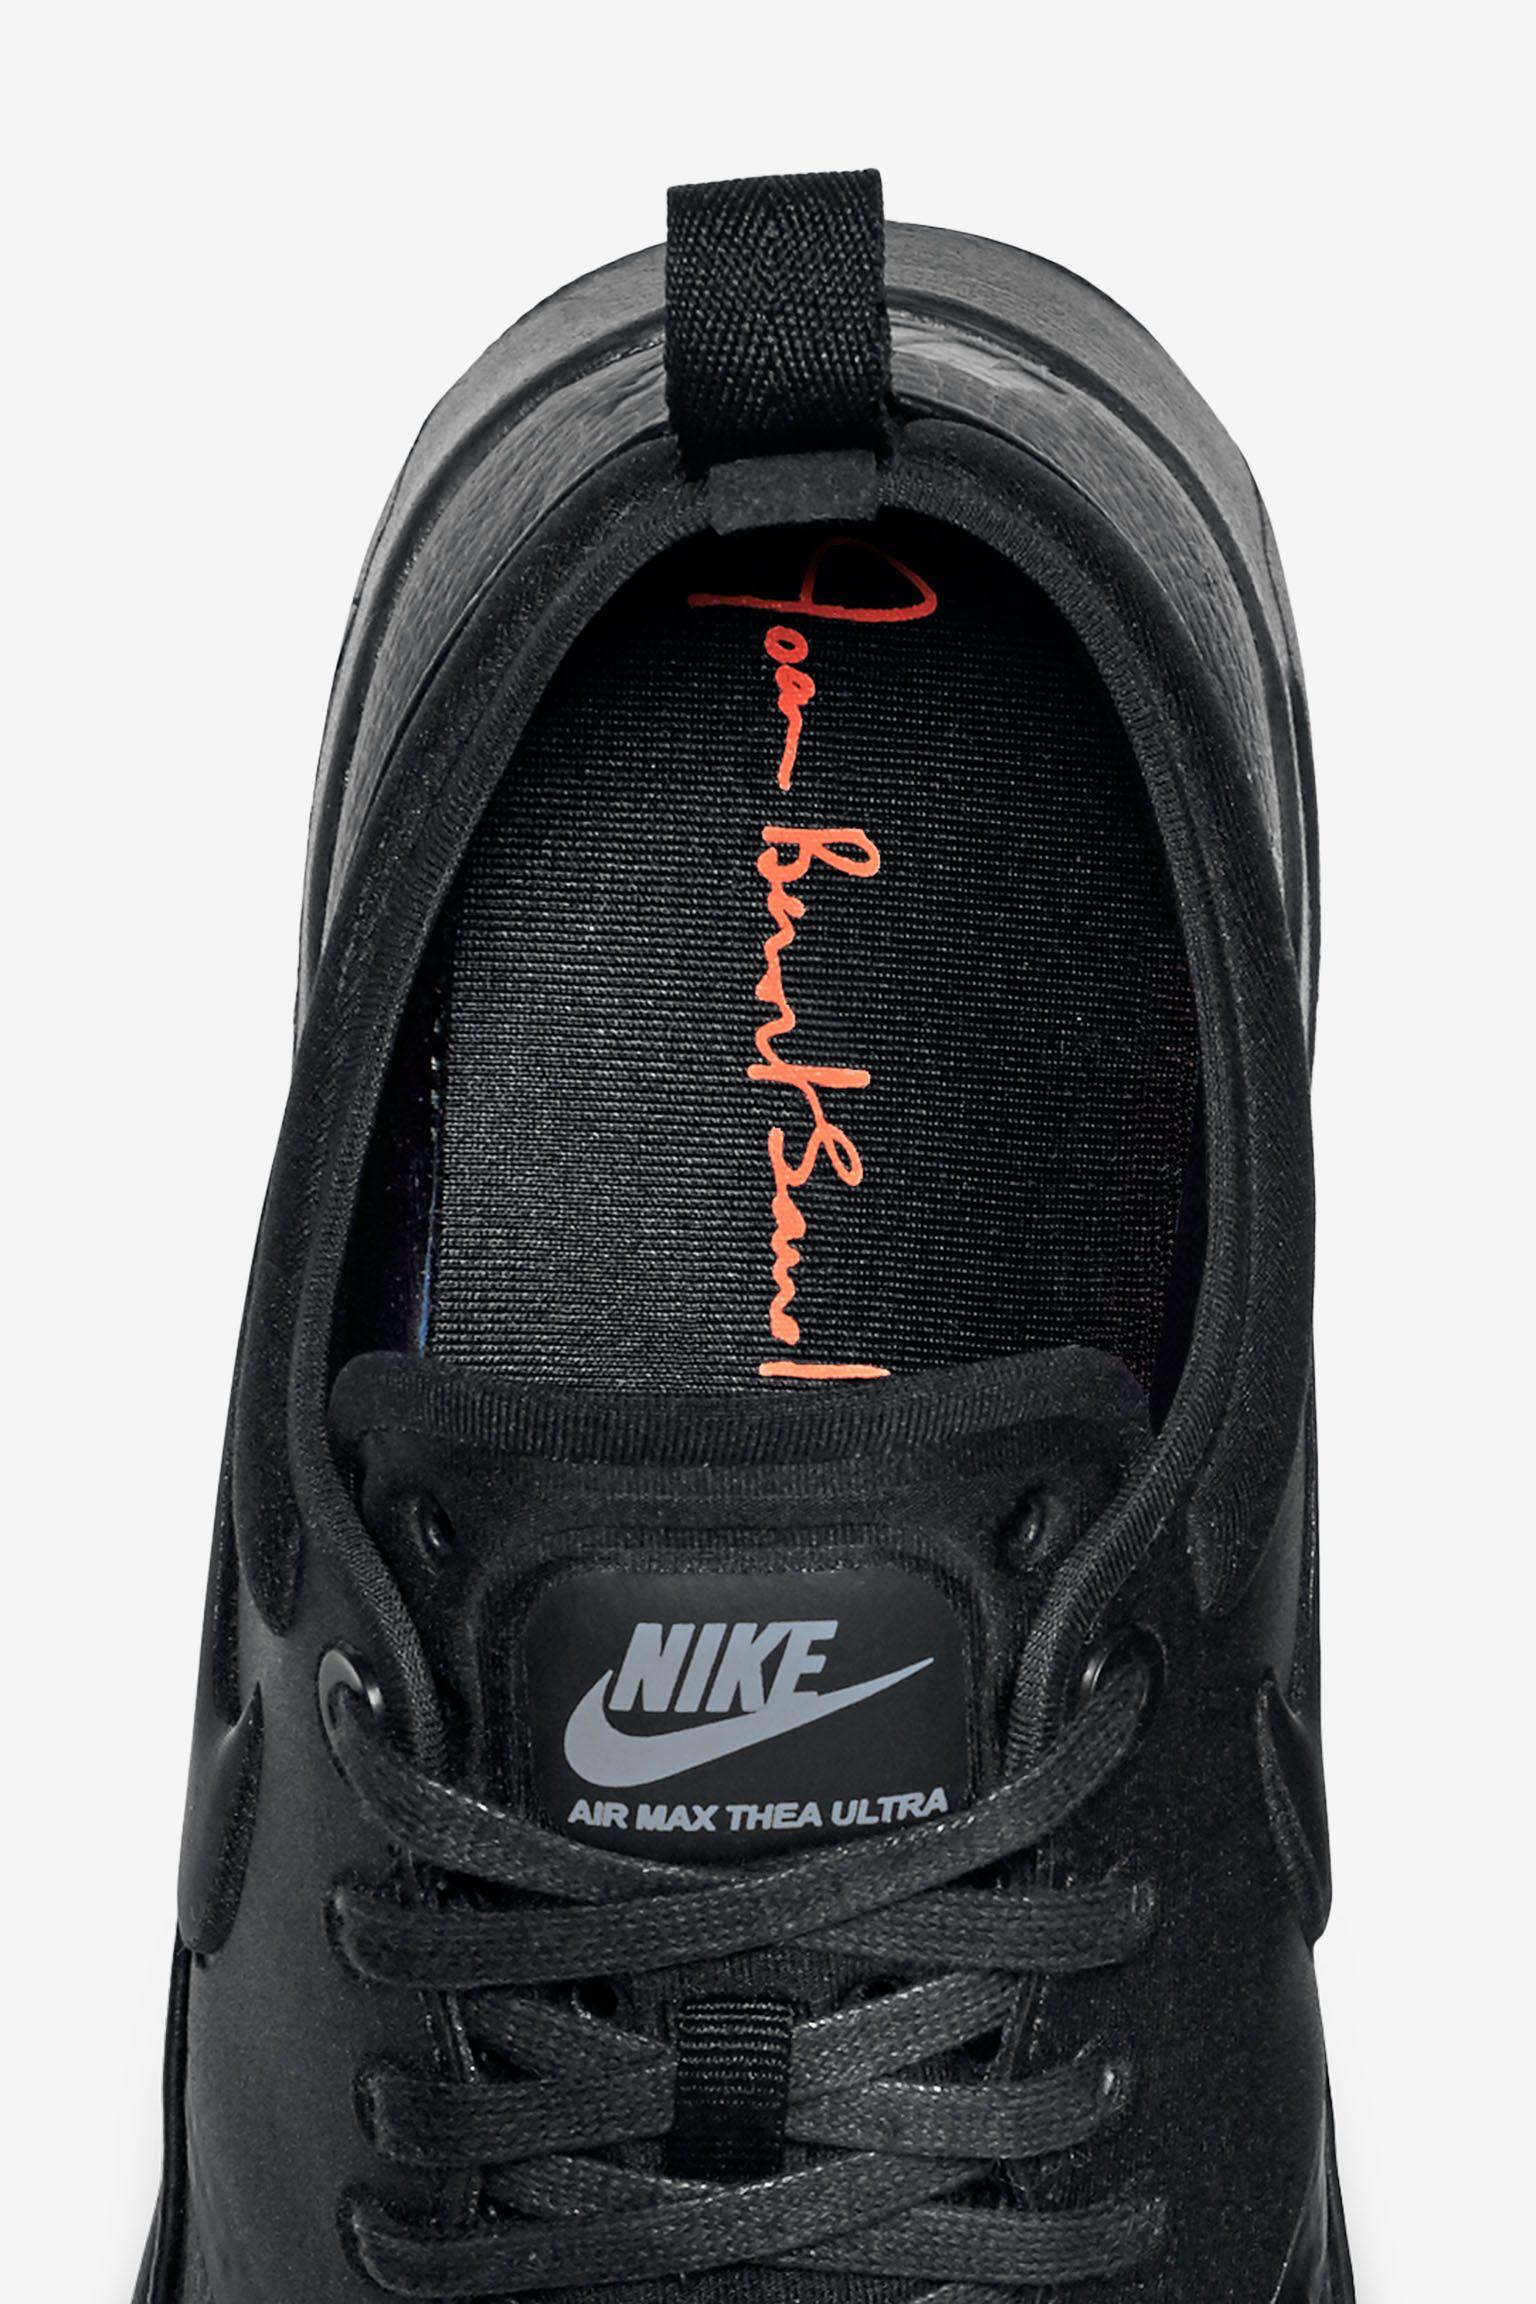 Nike Beautiful x Air Max Thea Ultra Premium